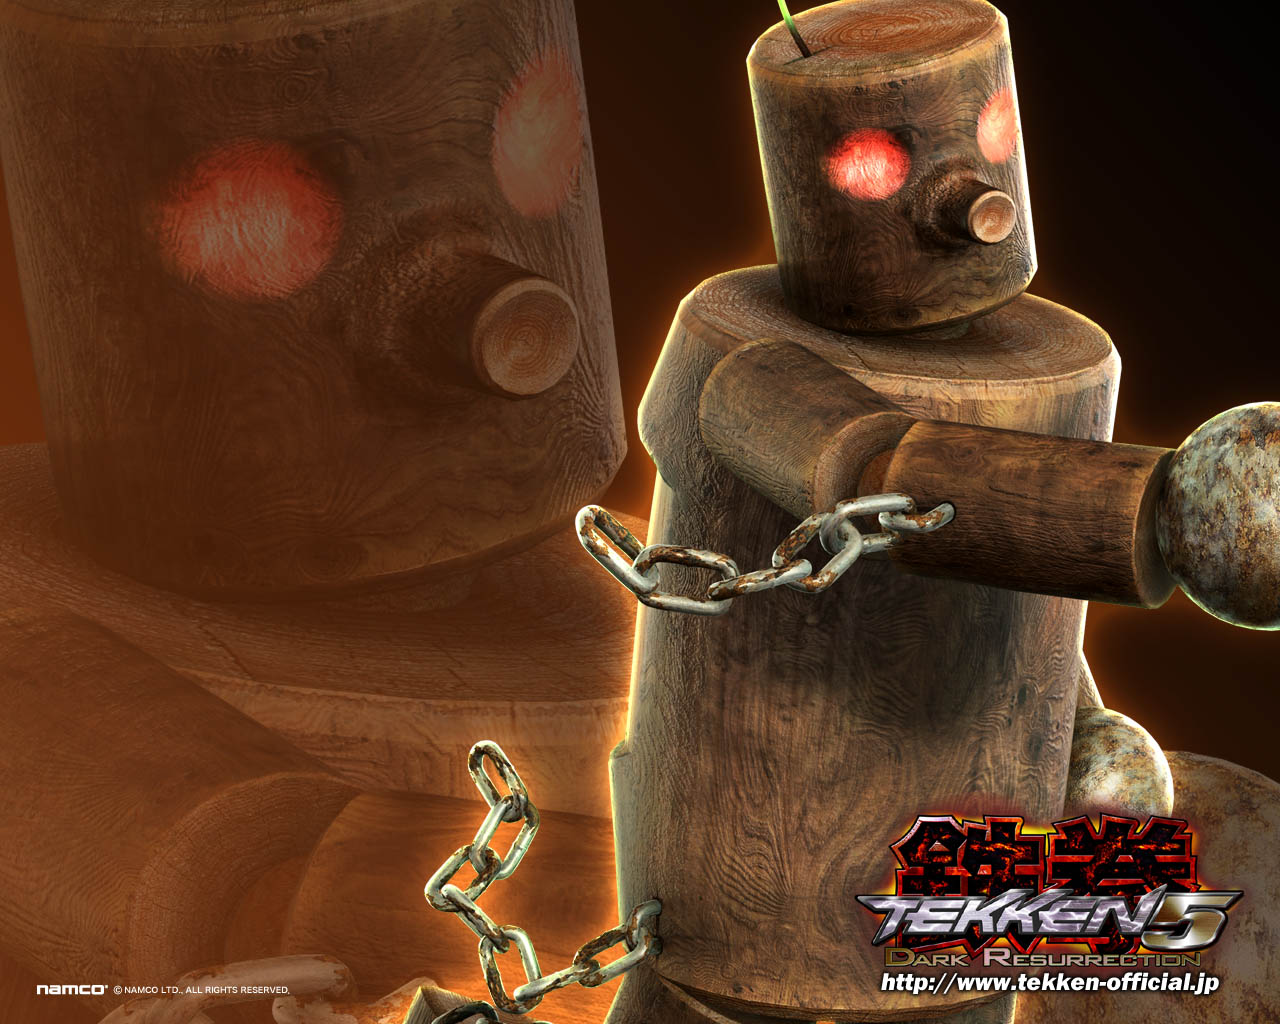 Dark Resurrection Wallpaper Tekken Wallpaper 243887 Fanpop